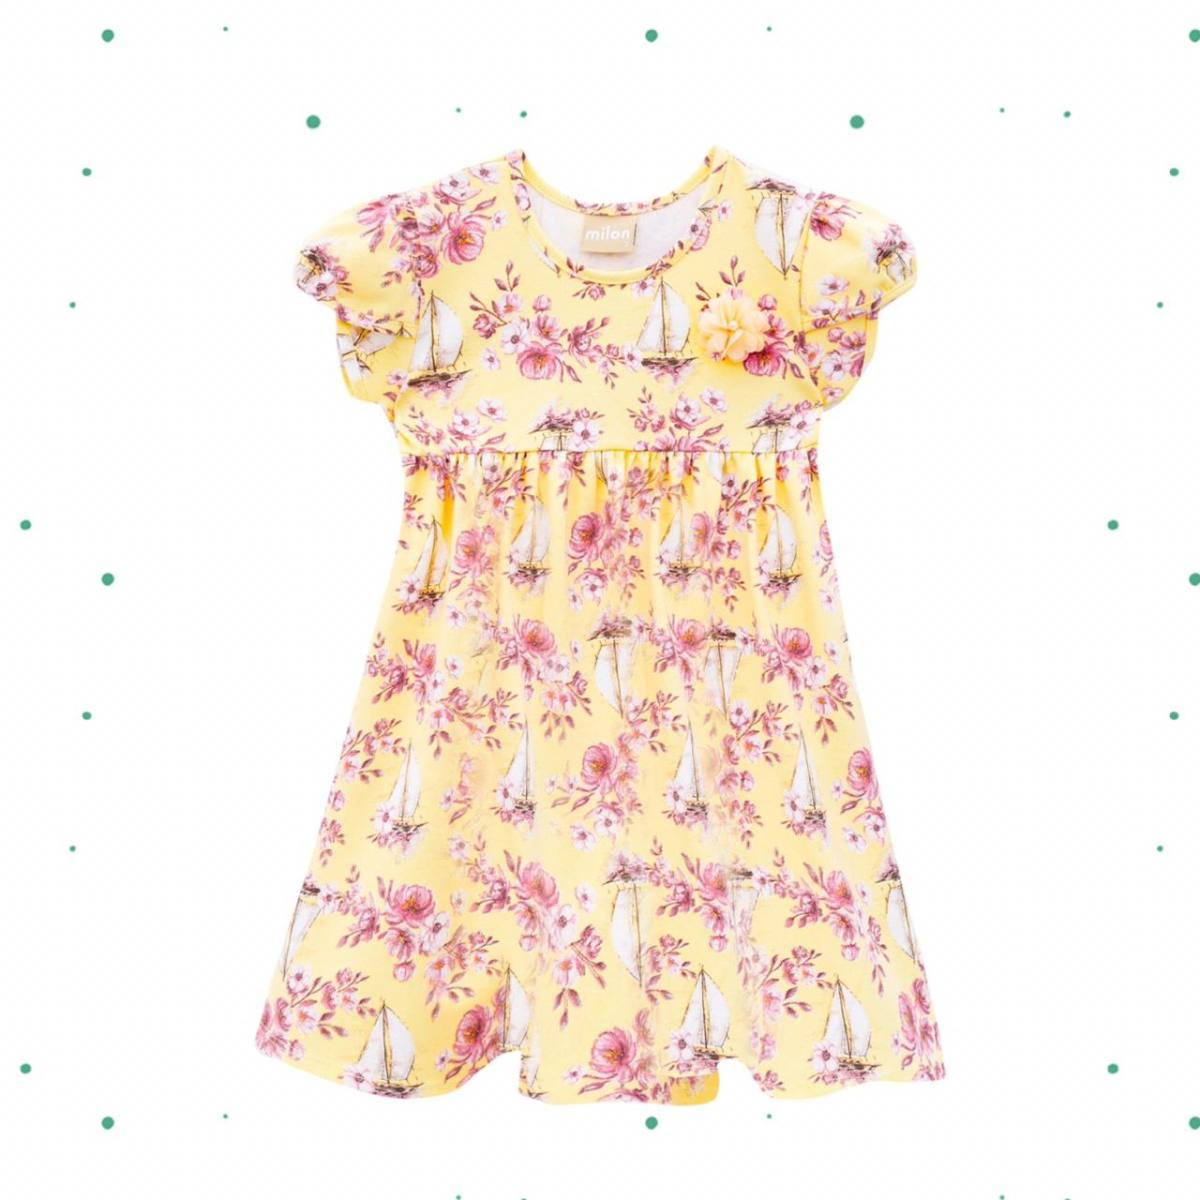 Vestido Infantil Milon em Cotton na Cor Amarelo